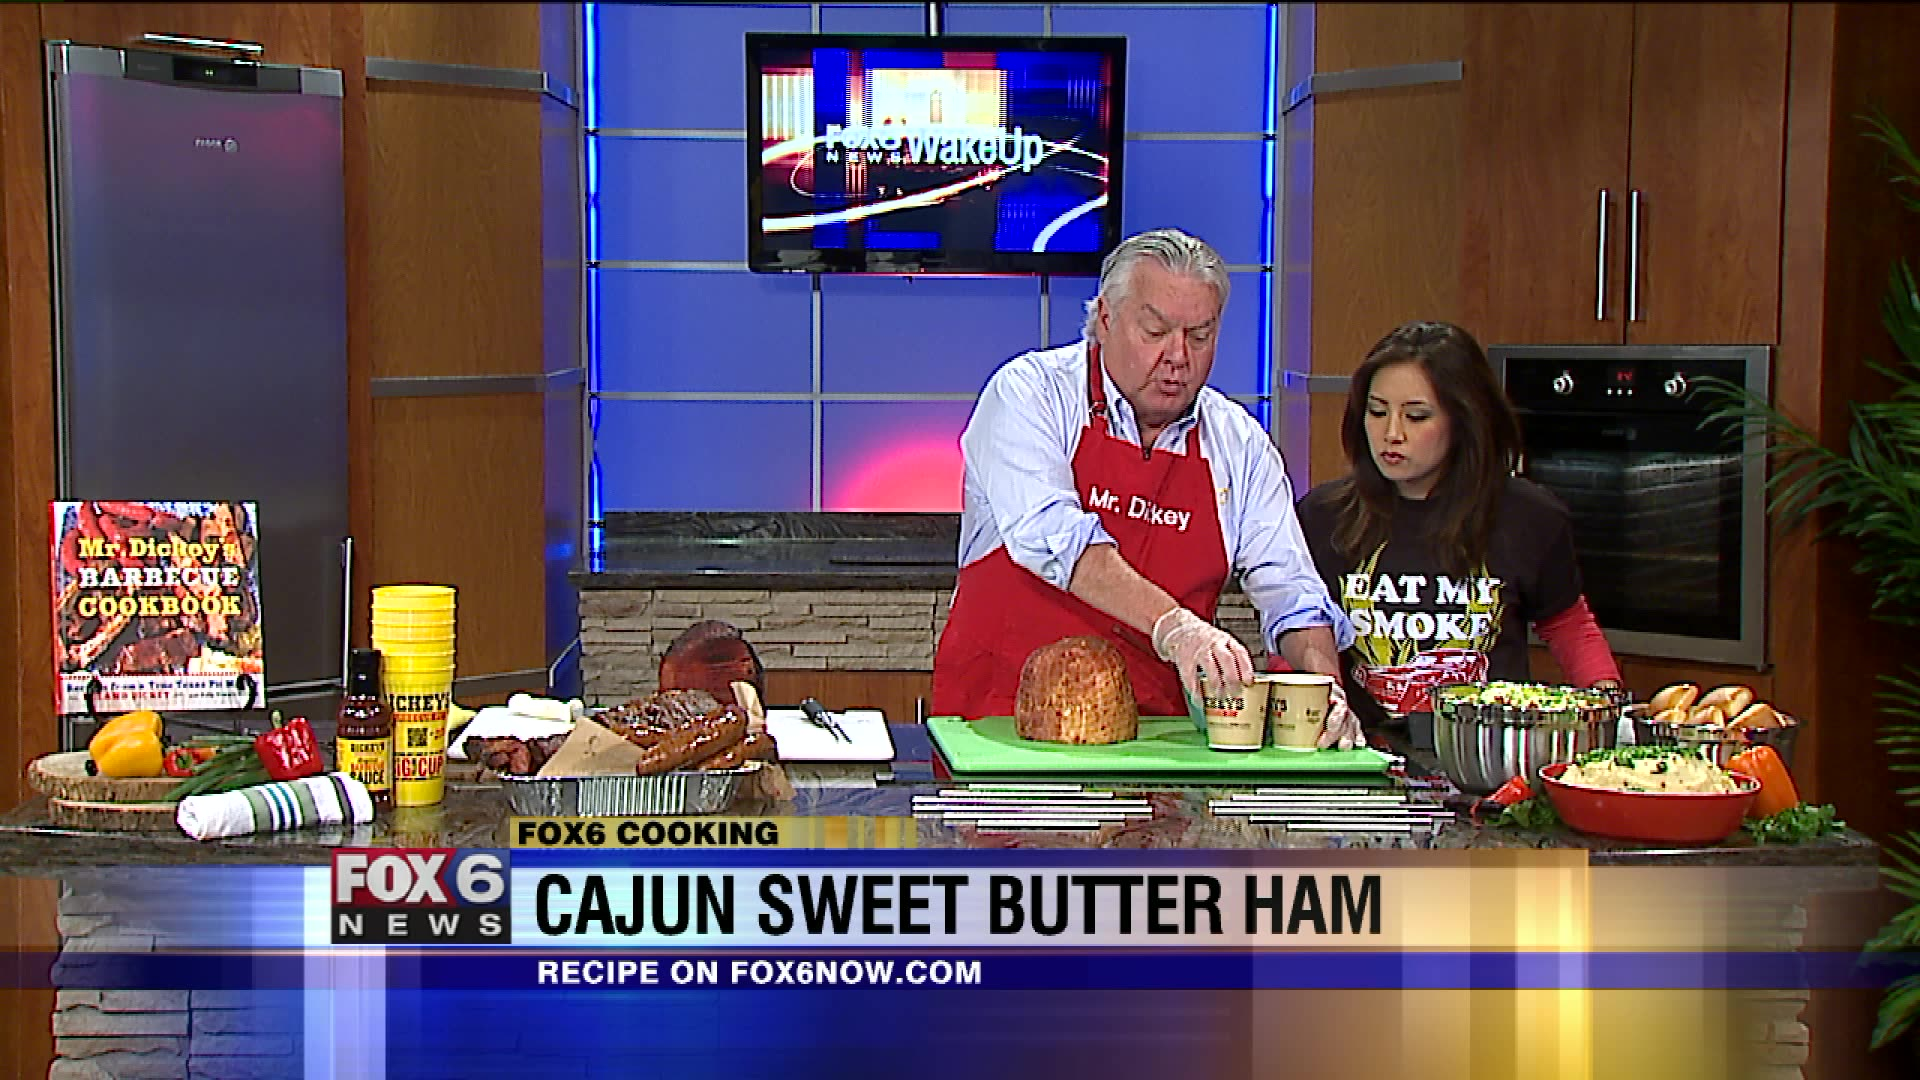 How to Make Cajun Sweet Butter Ham